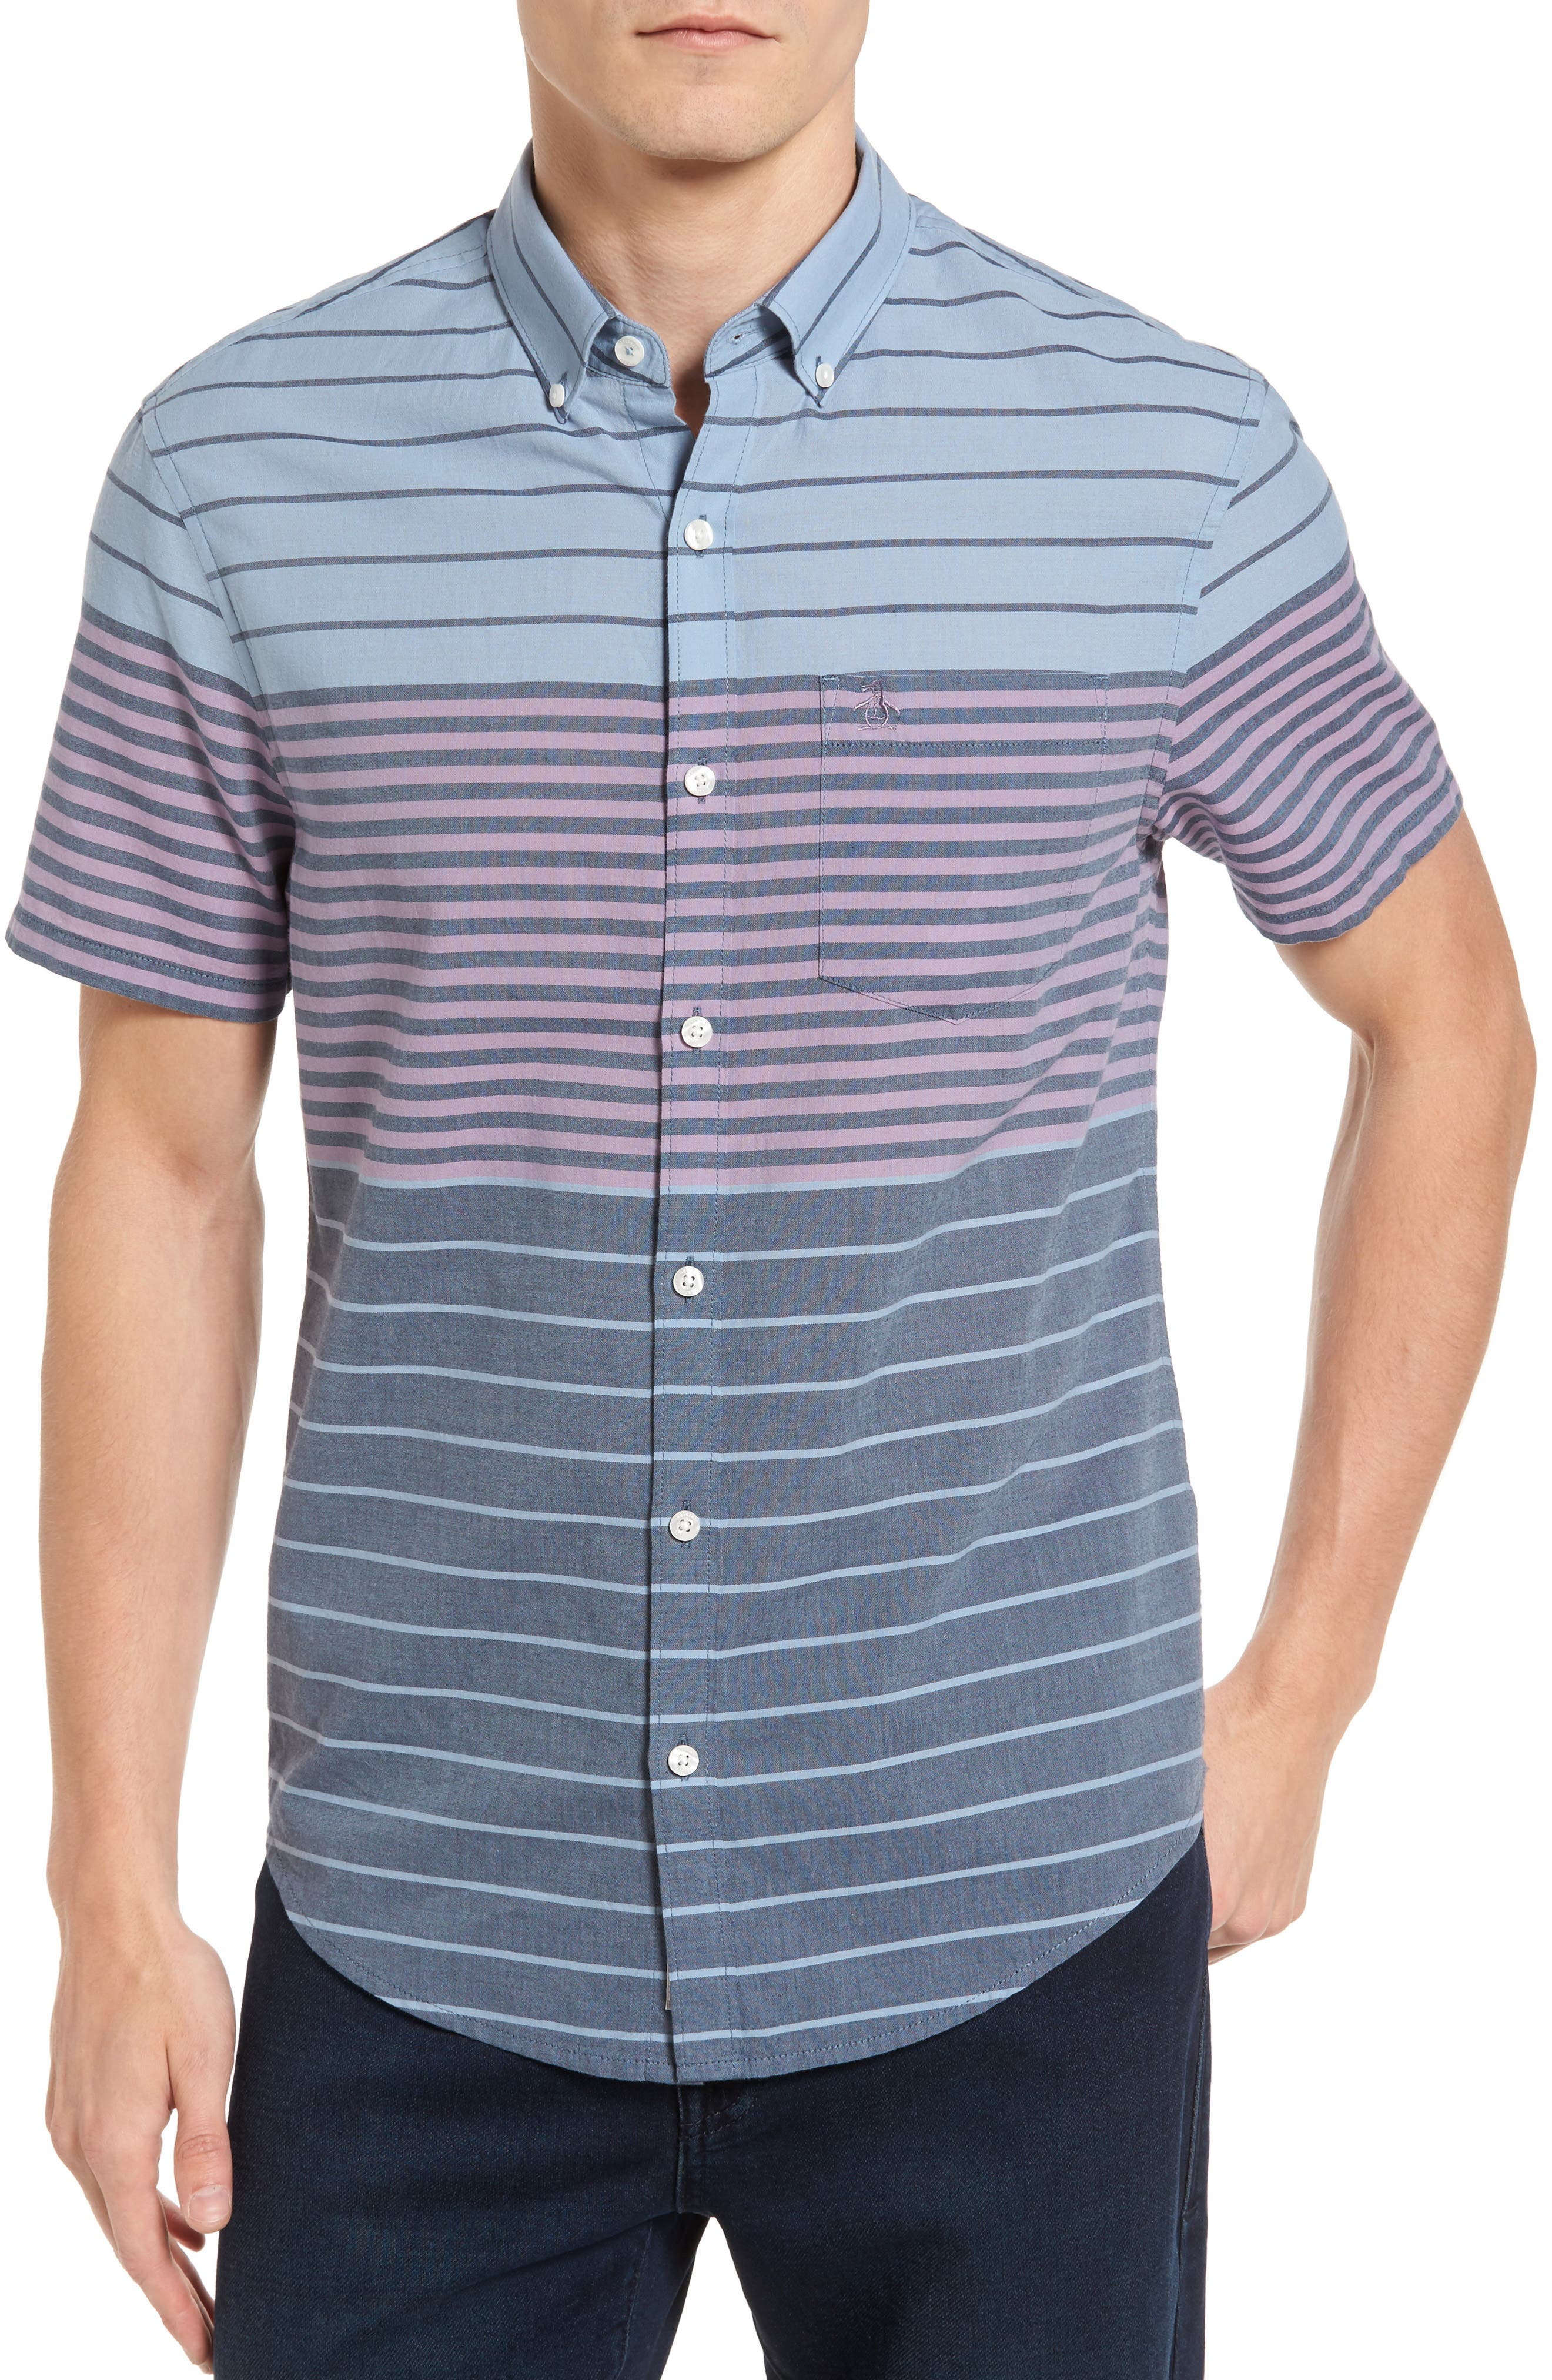 Original Penguin Heritage Slim Fit Colorblock Stripe Shirt